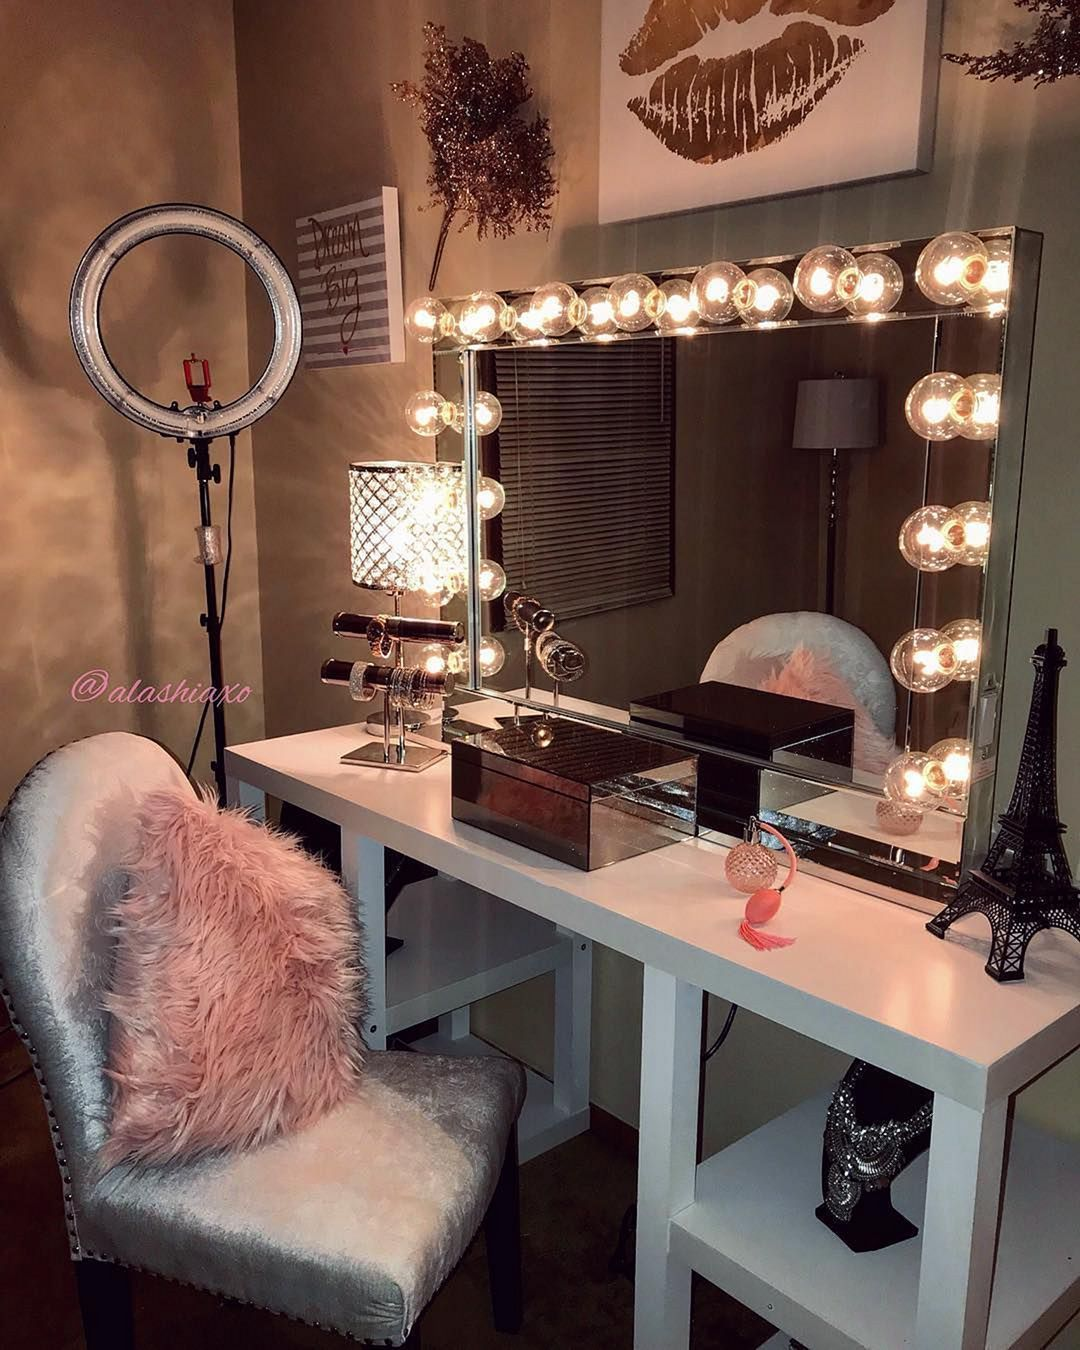 15 Impressive Diy Makeup Vanity Decoration Ideas That You Will Love It Beauty Room Glam Room Vanity Decor